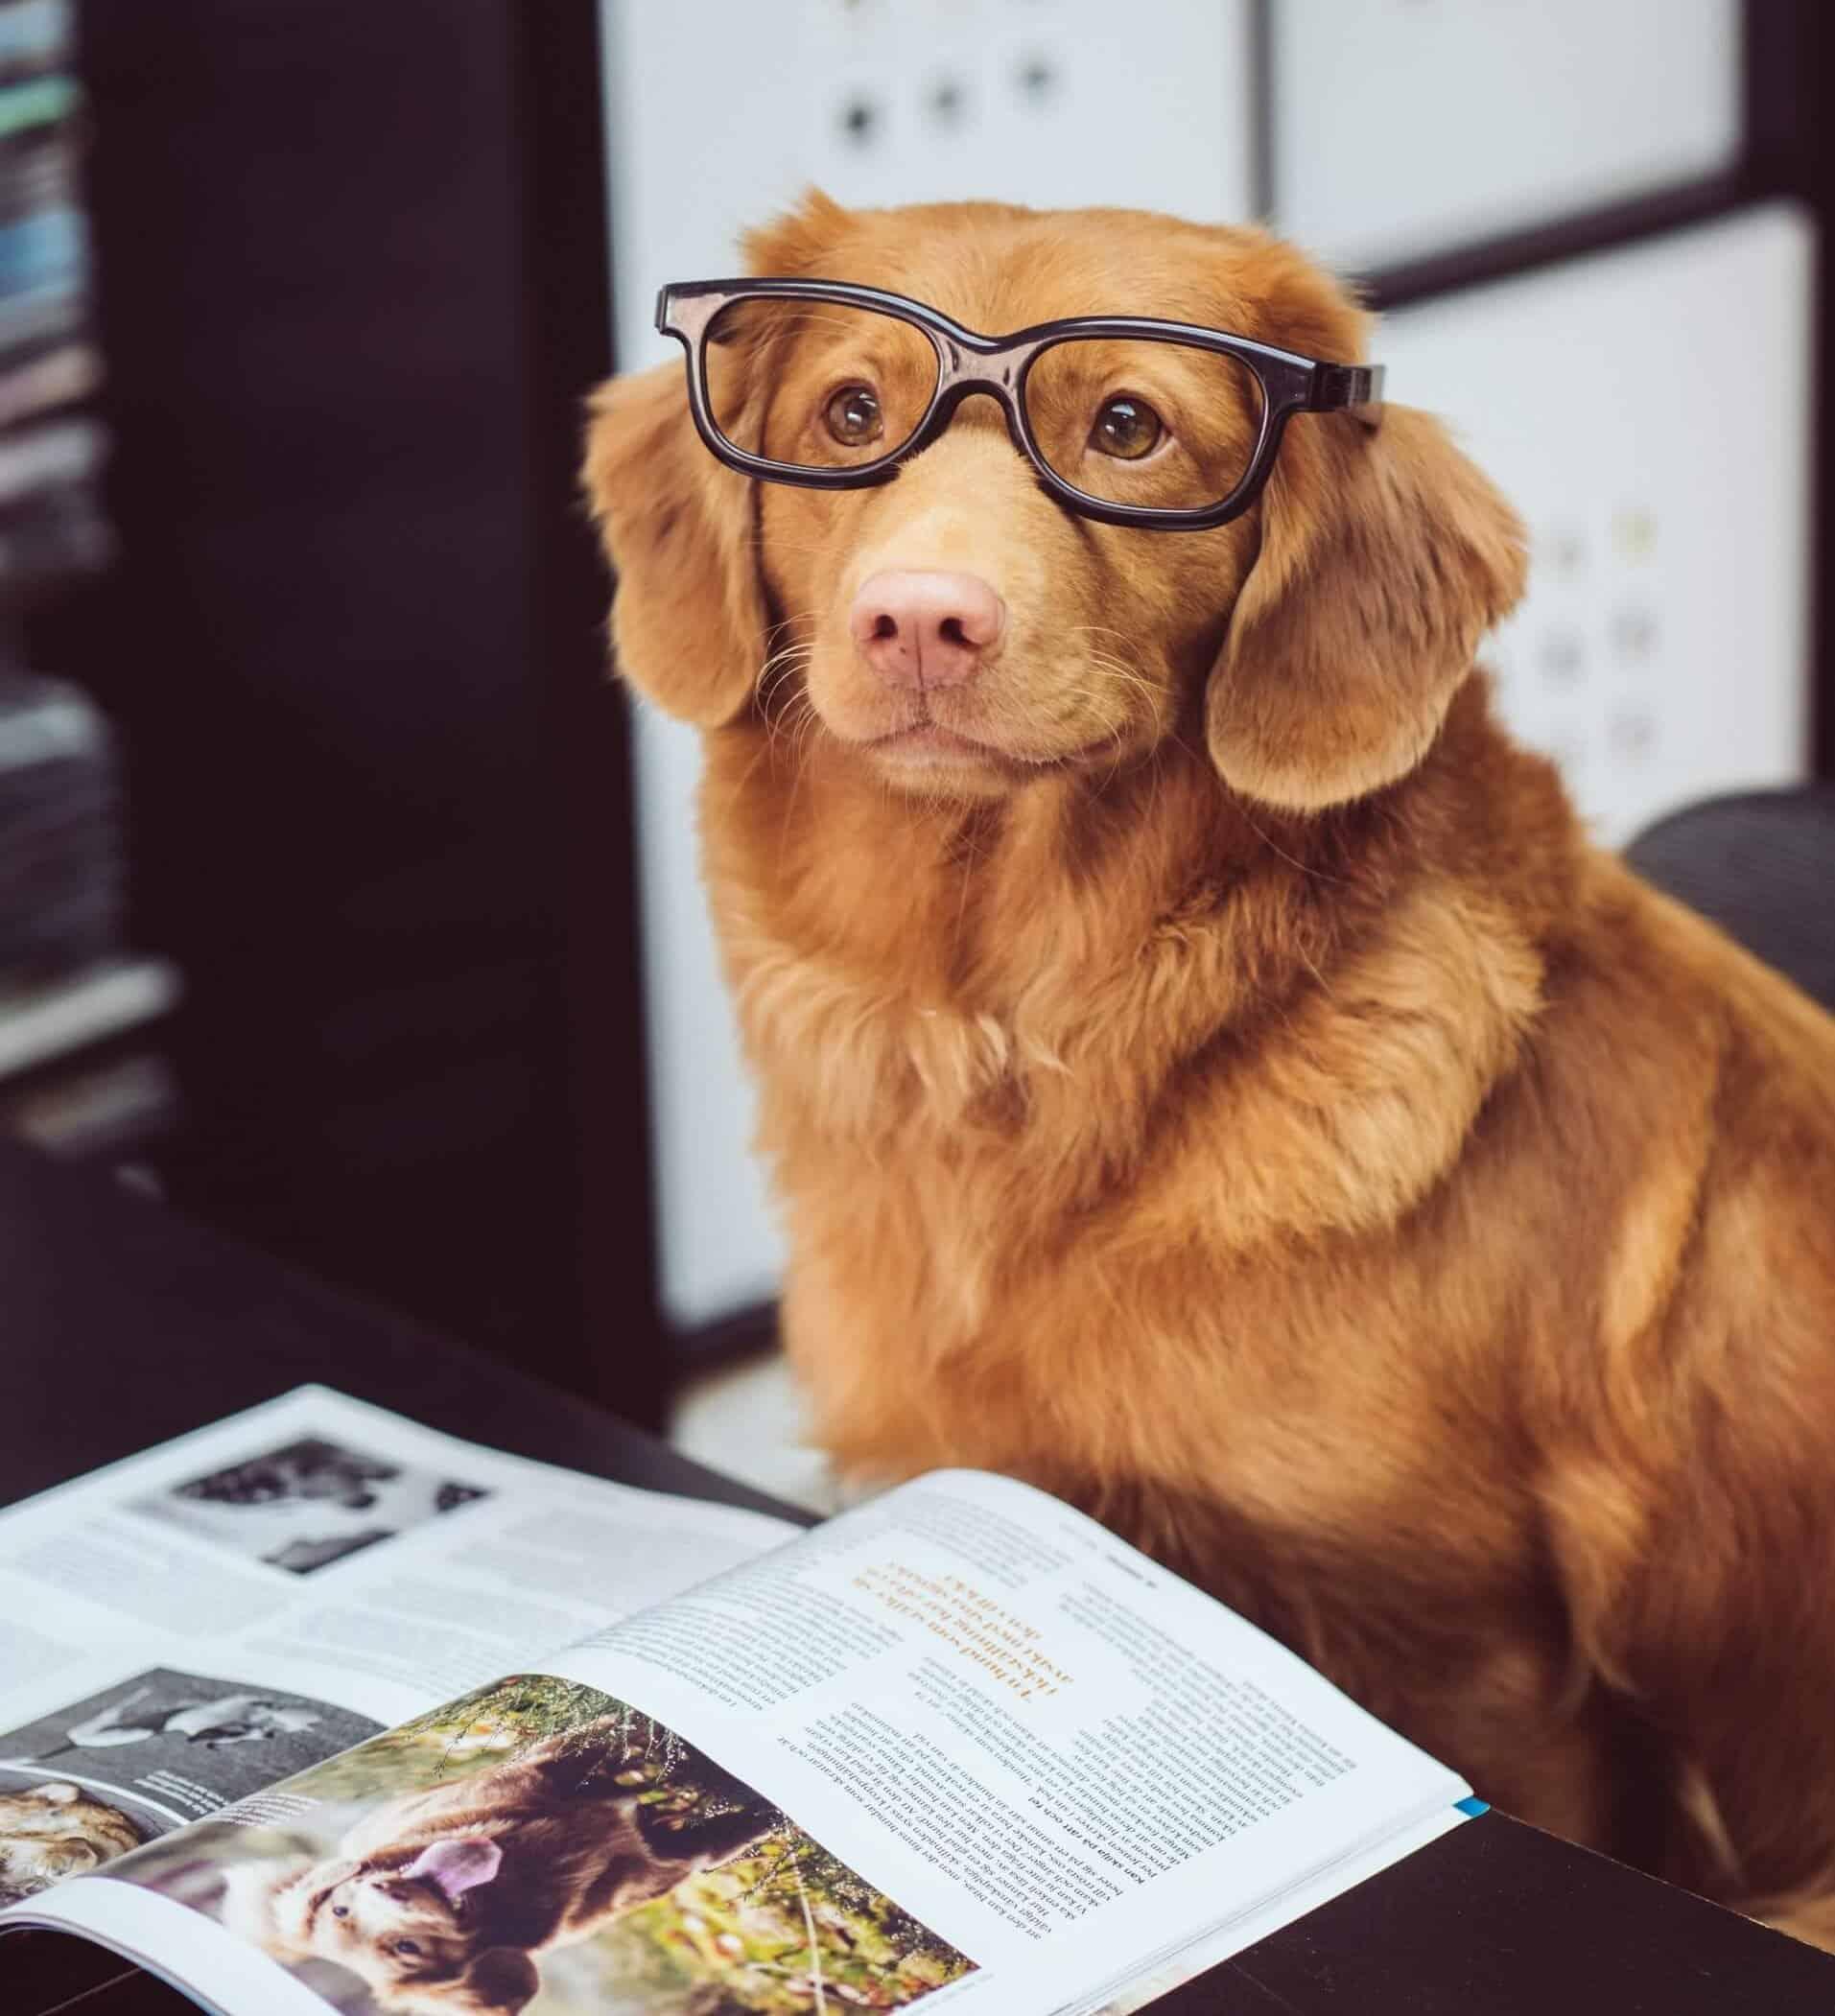 pandas read_csv tutorial dog reading